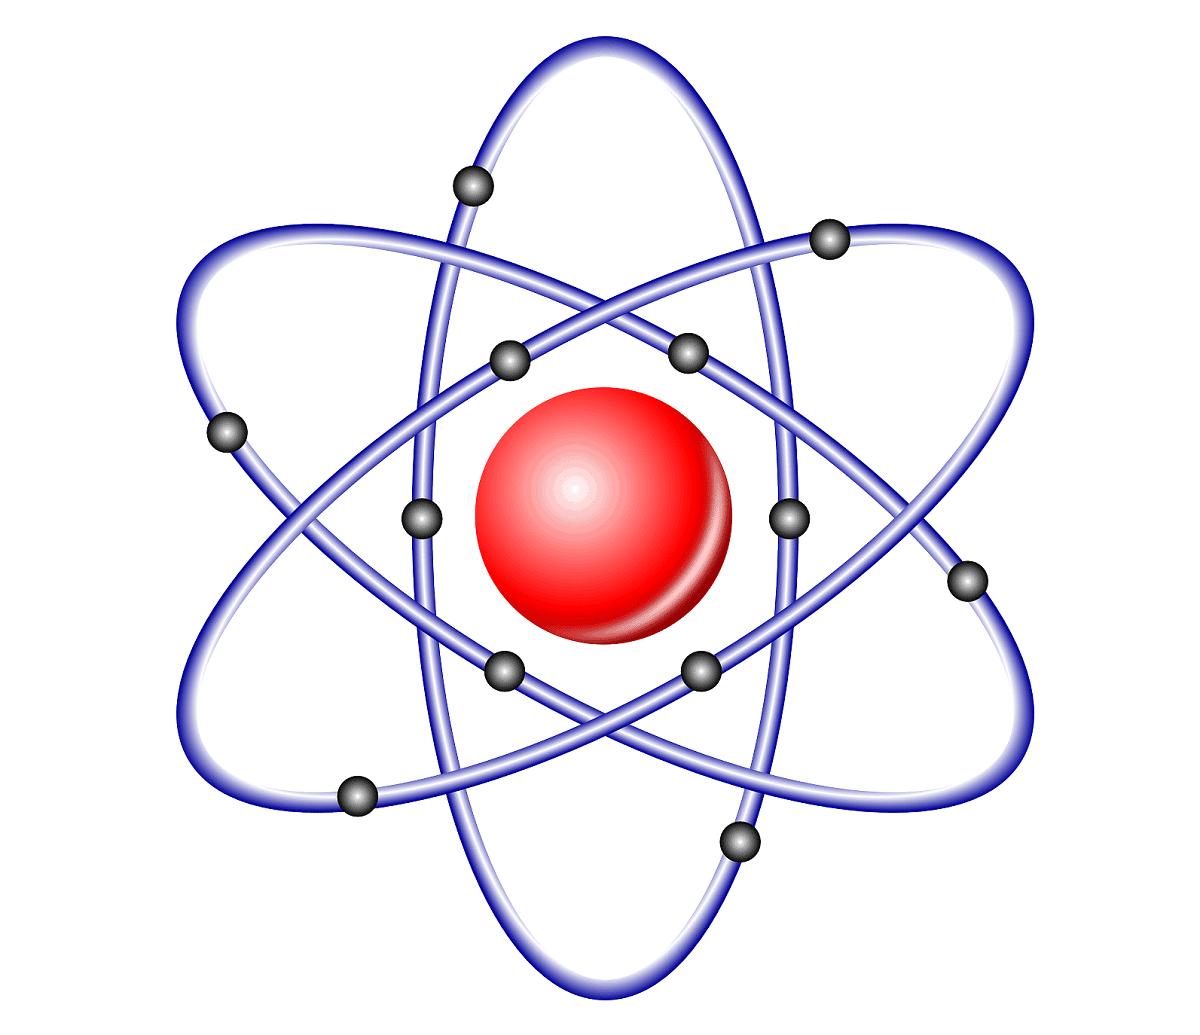 Postulados del Modelo Atómico de Dalton